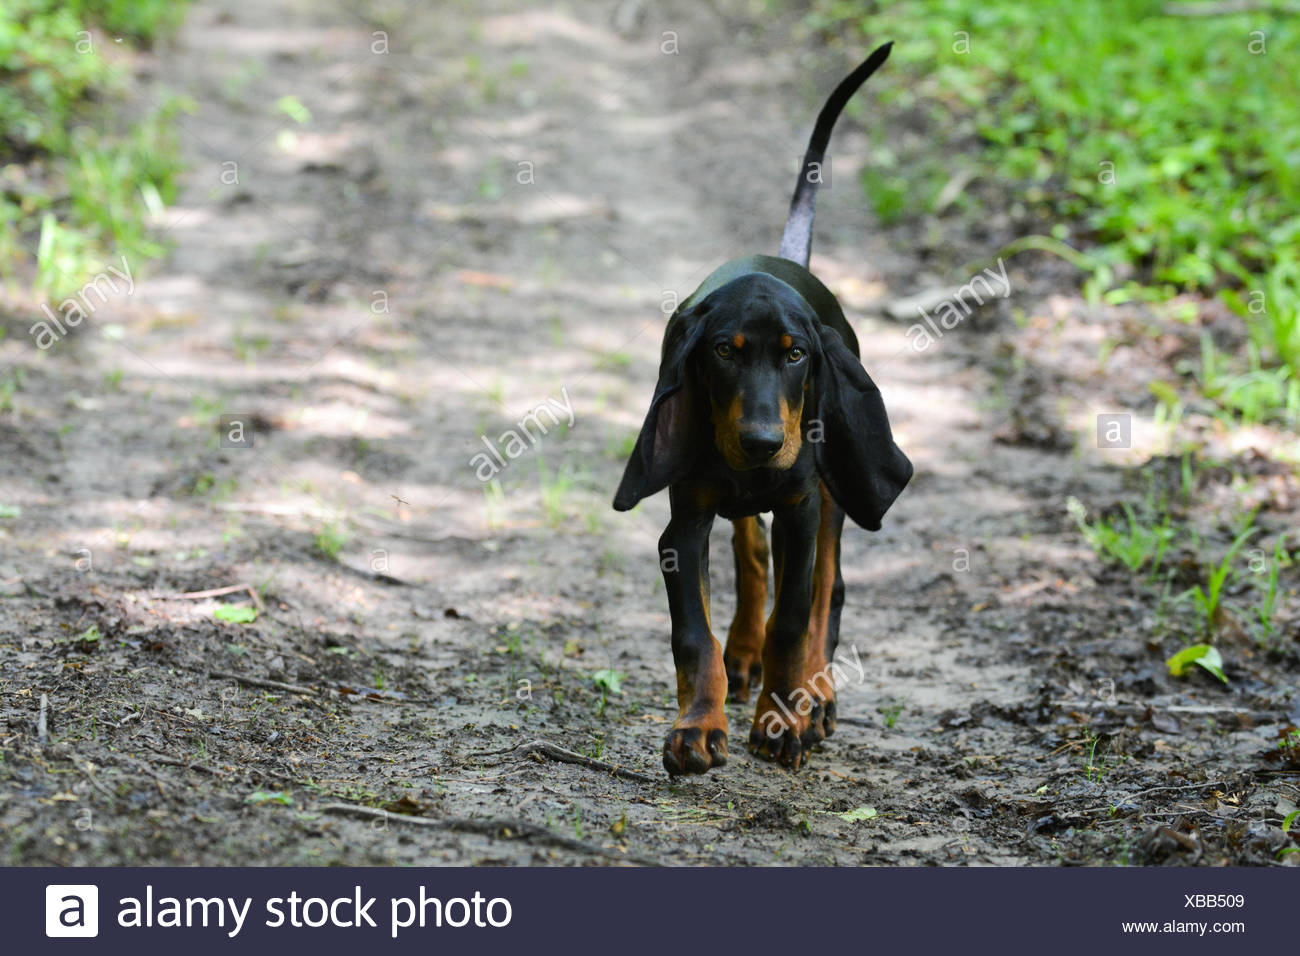 Black Tan Coonhound Walking On Stock Photos & Black Tan ...